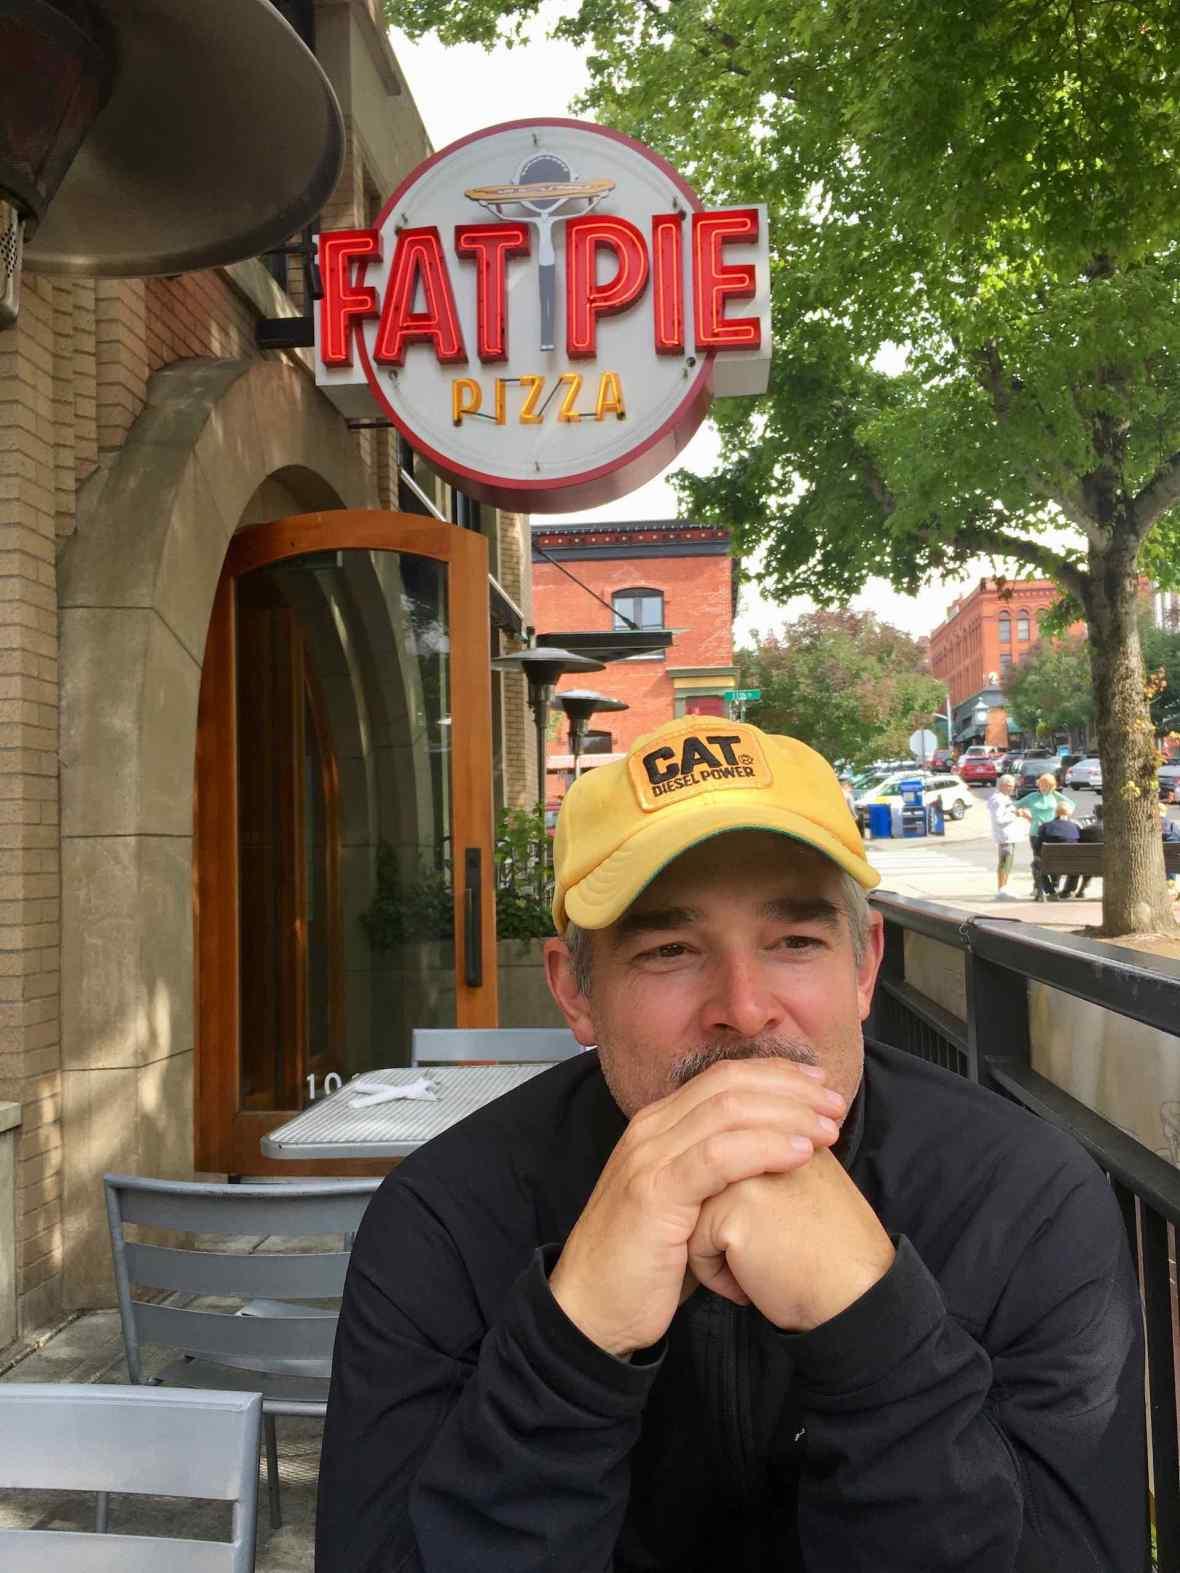 Fat Pie Pizza in Fairhaven, Bellingham, Washington